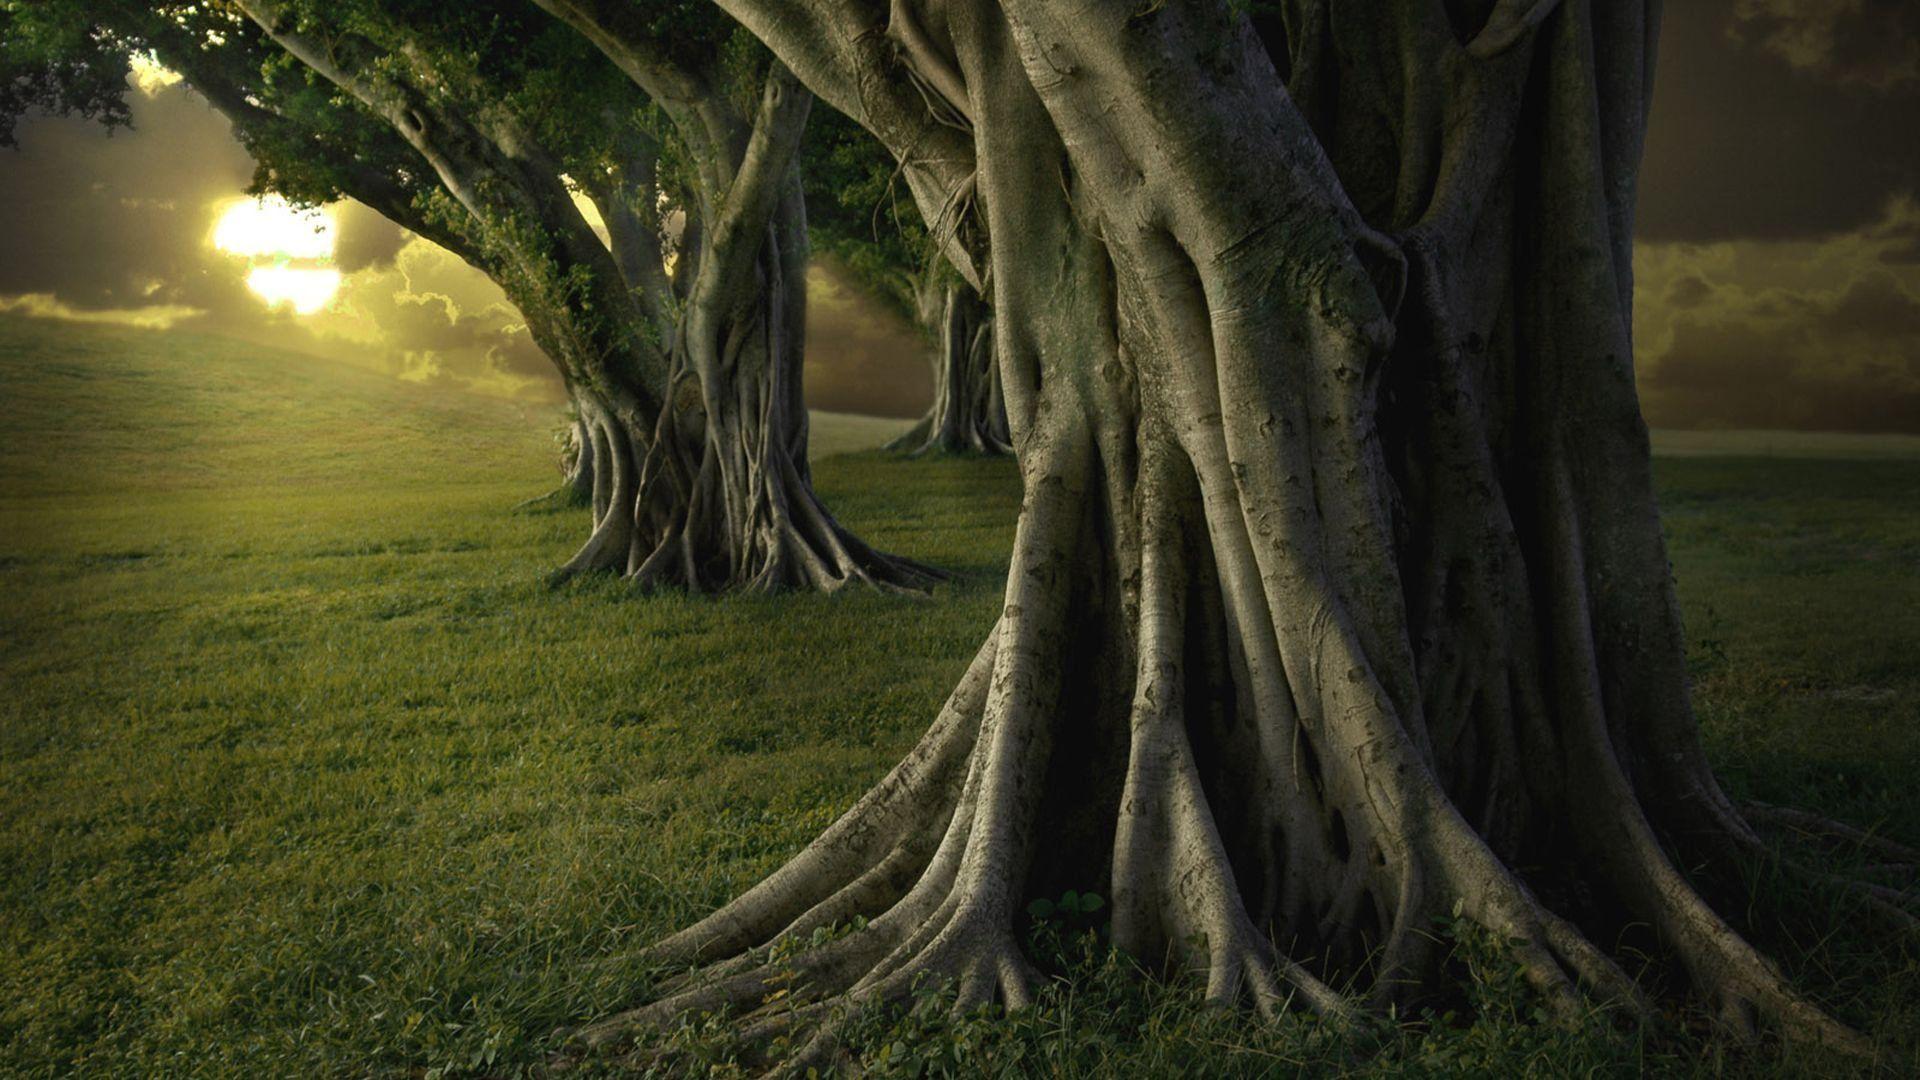 tree pic hd